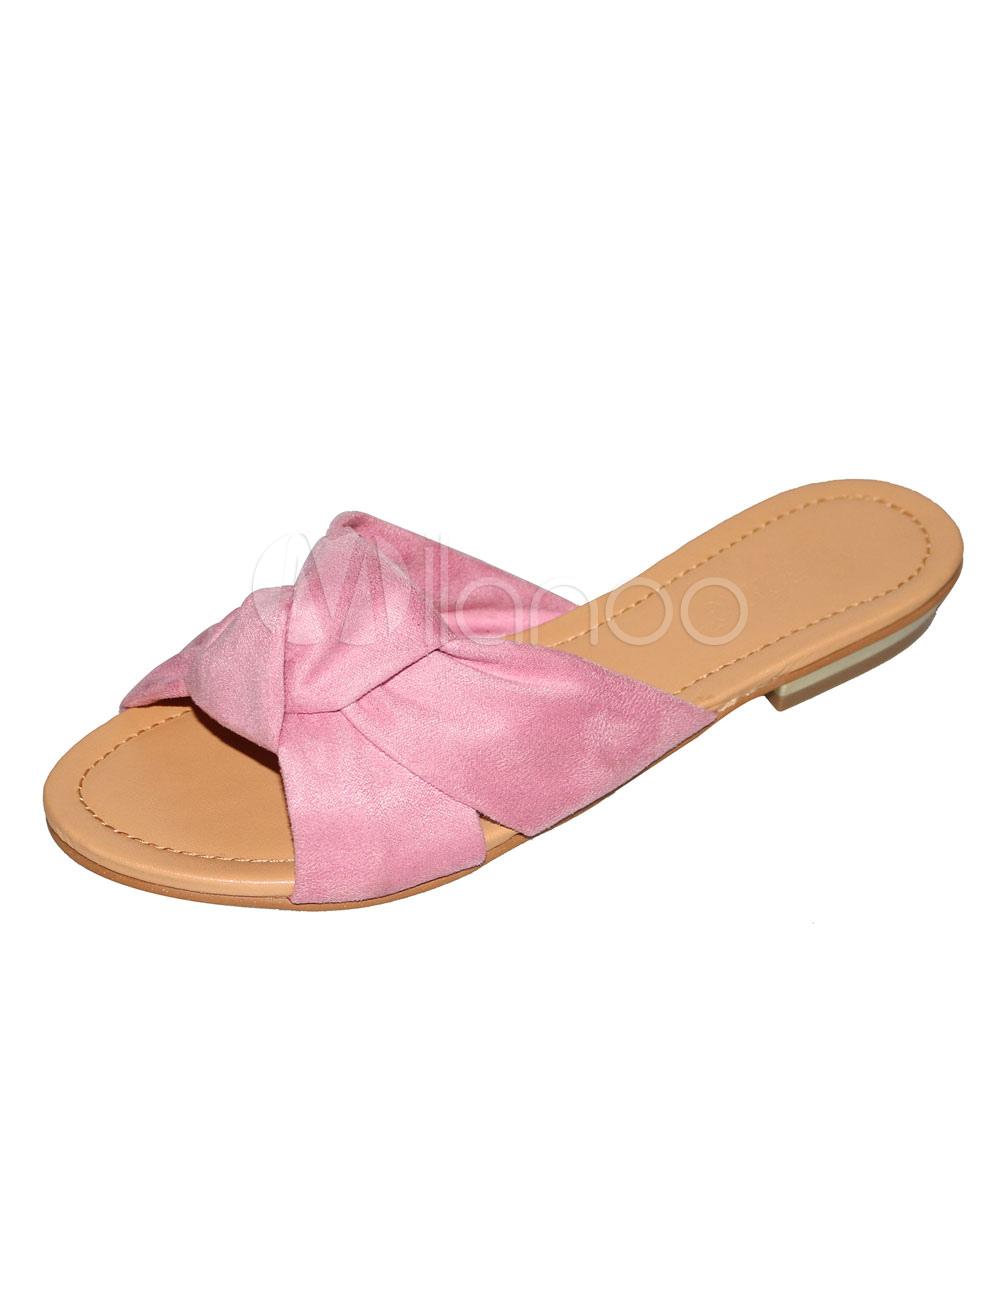 38978962b0c Women Slide Sandals Soft Pink Knotted Flat Sandals Terry Sandal ...